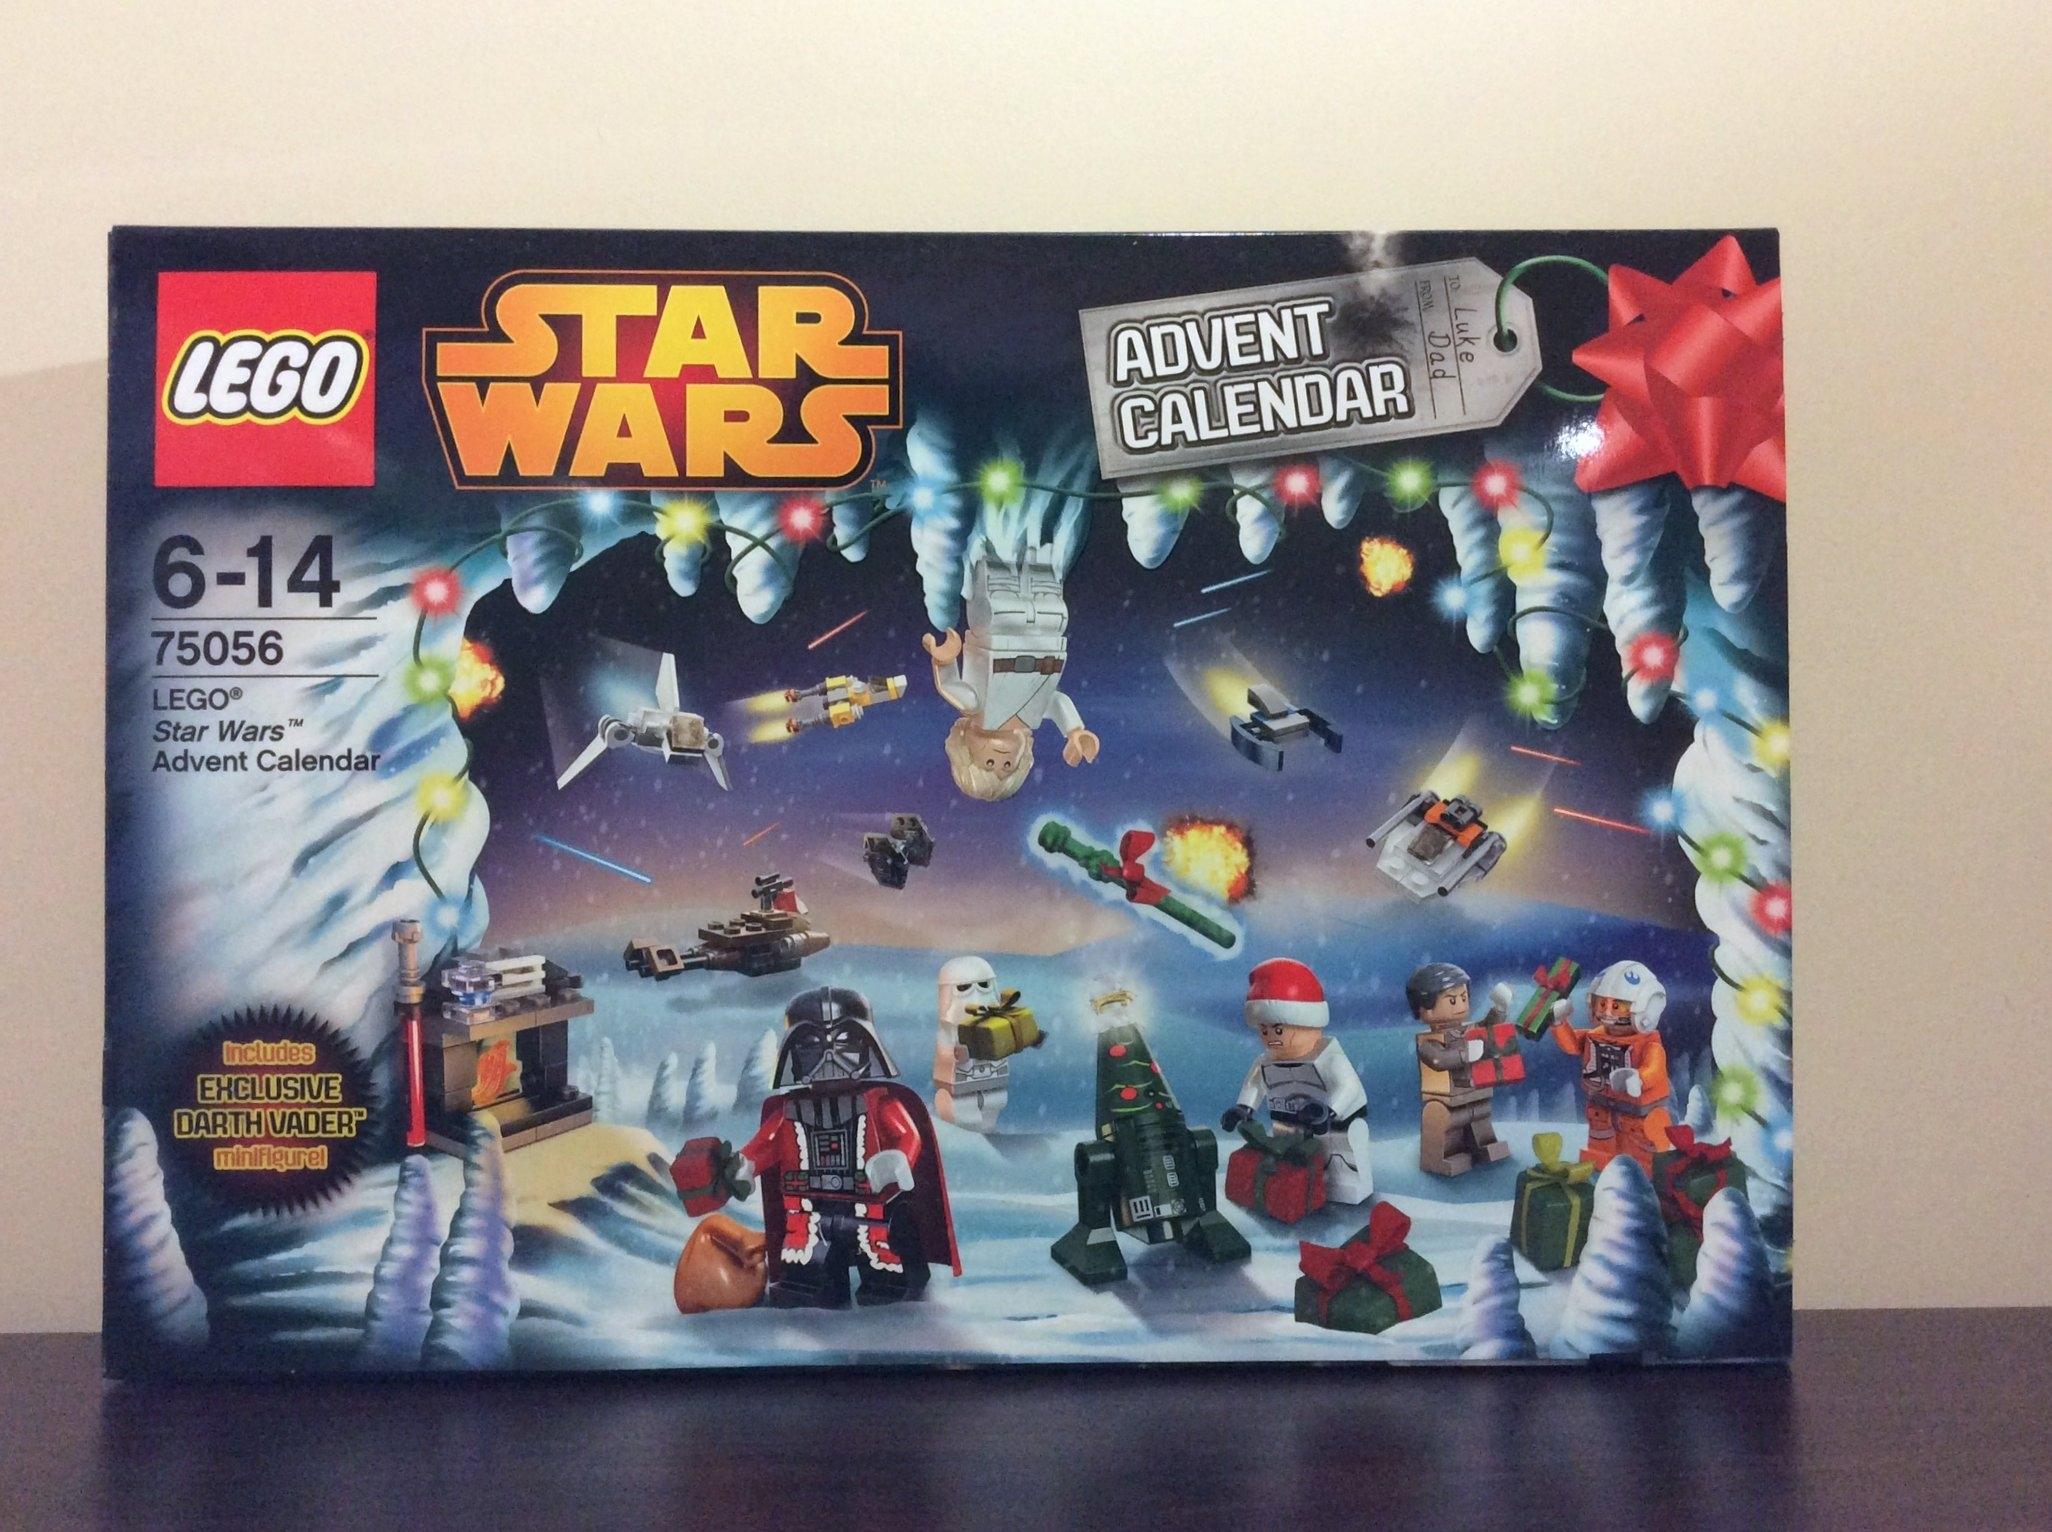 Pick Lego Star Wars Advent Calendar 2021 Code